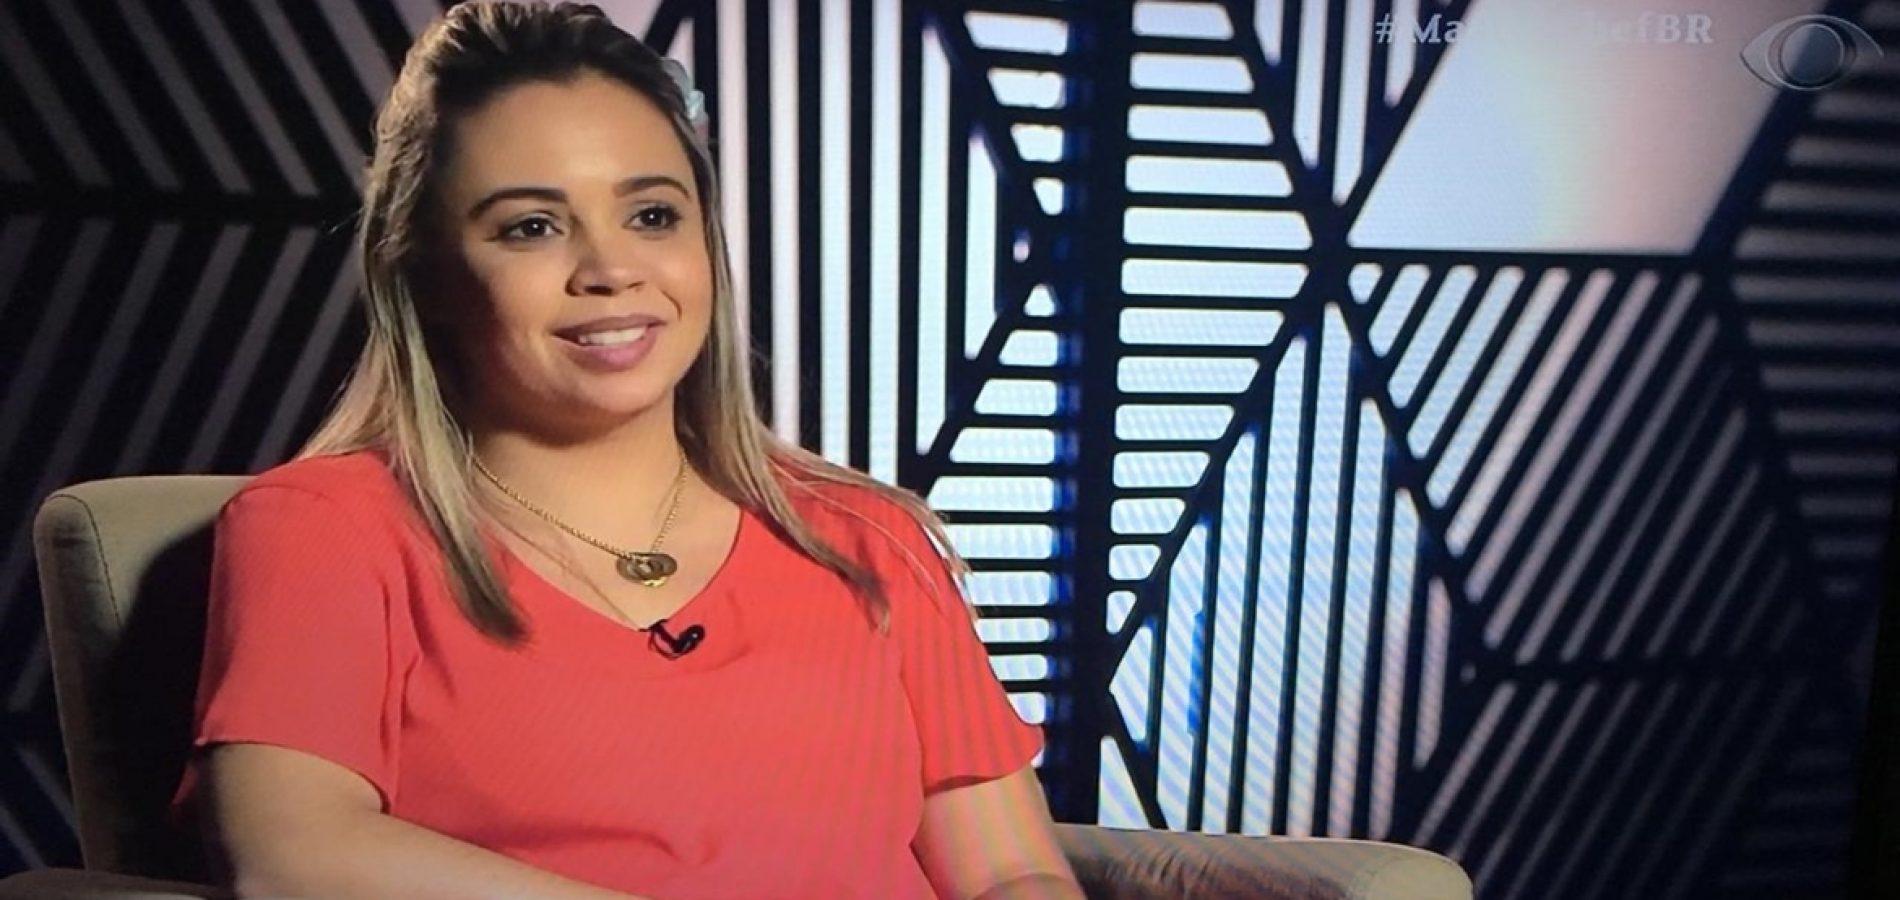 Piauiense Lorena Dayse fica em segundo lugar no MasterChef 2019